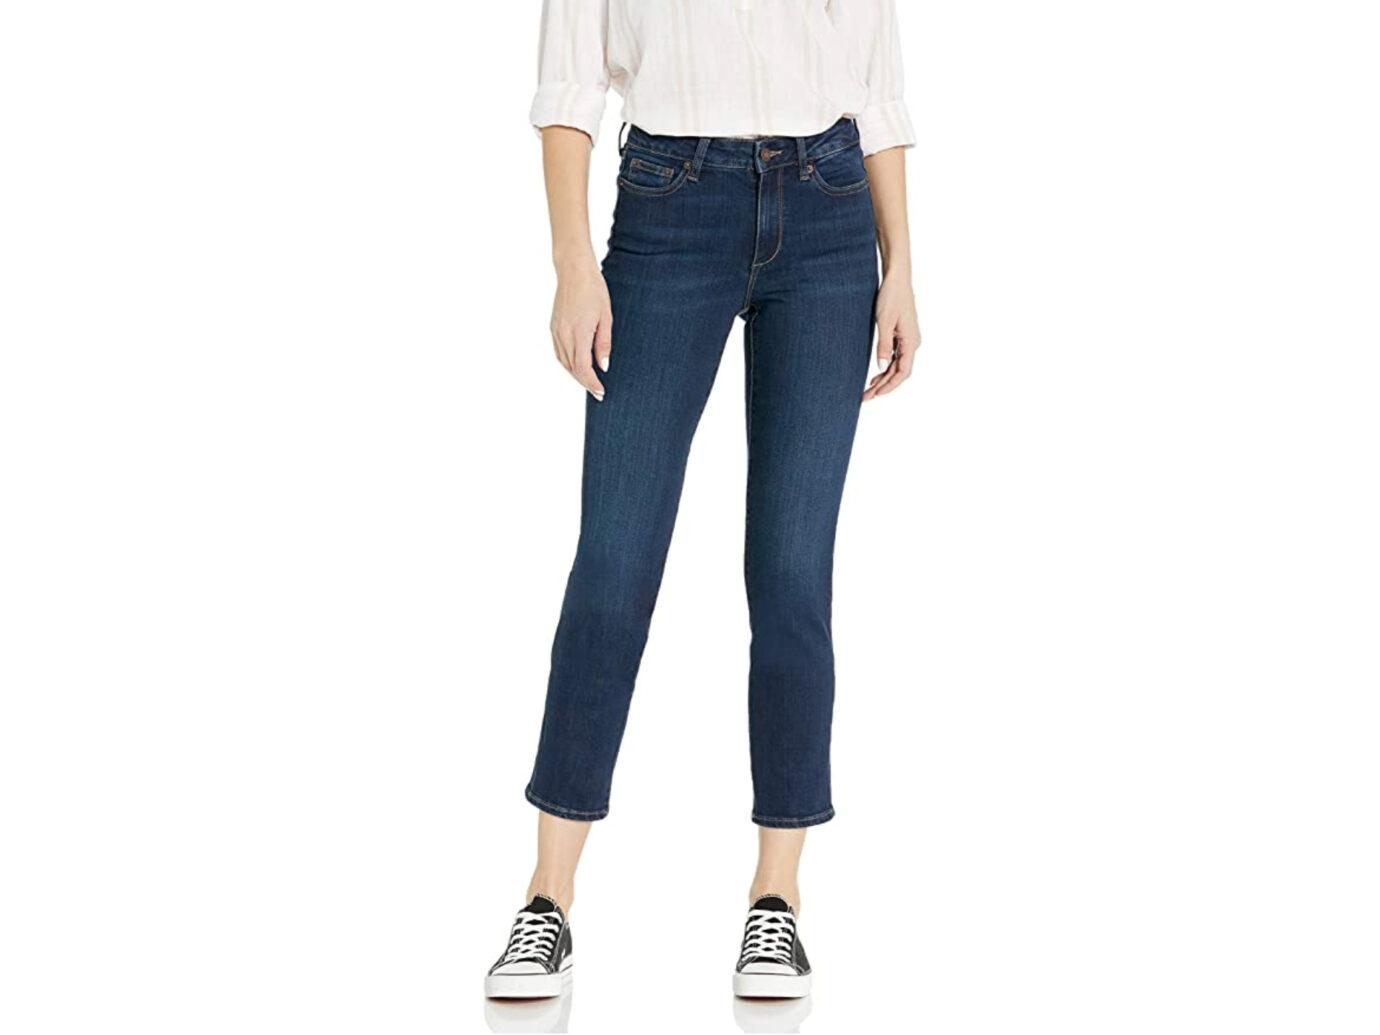 Amazon Brand - Goodthreads Women's High-Rise Slim Straight Jean